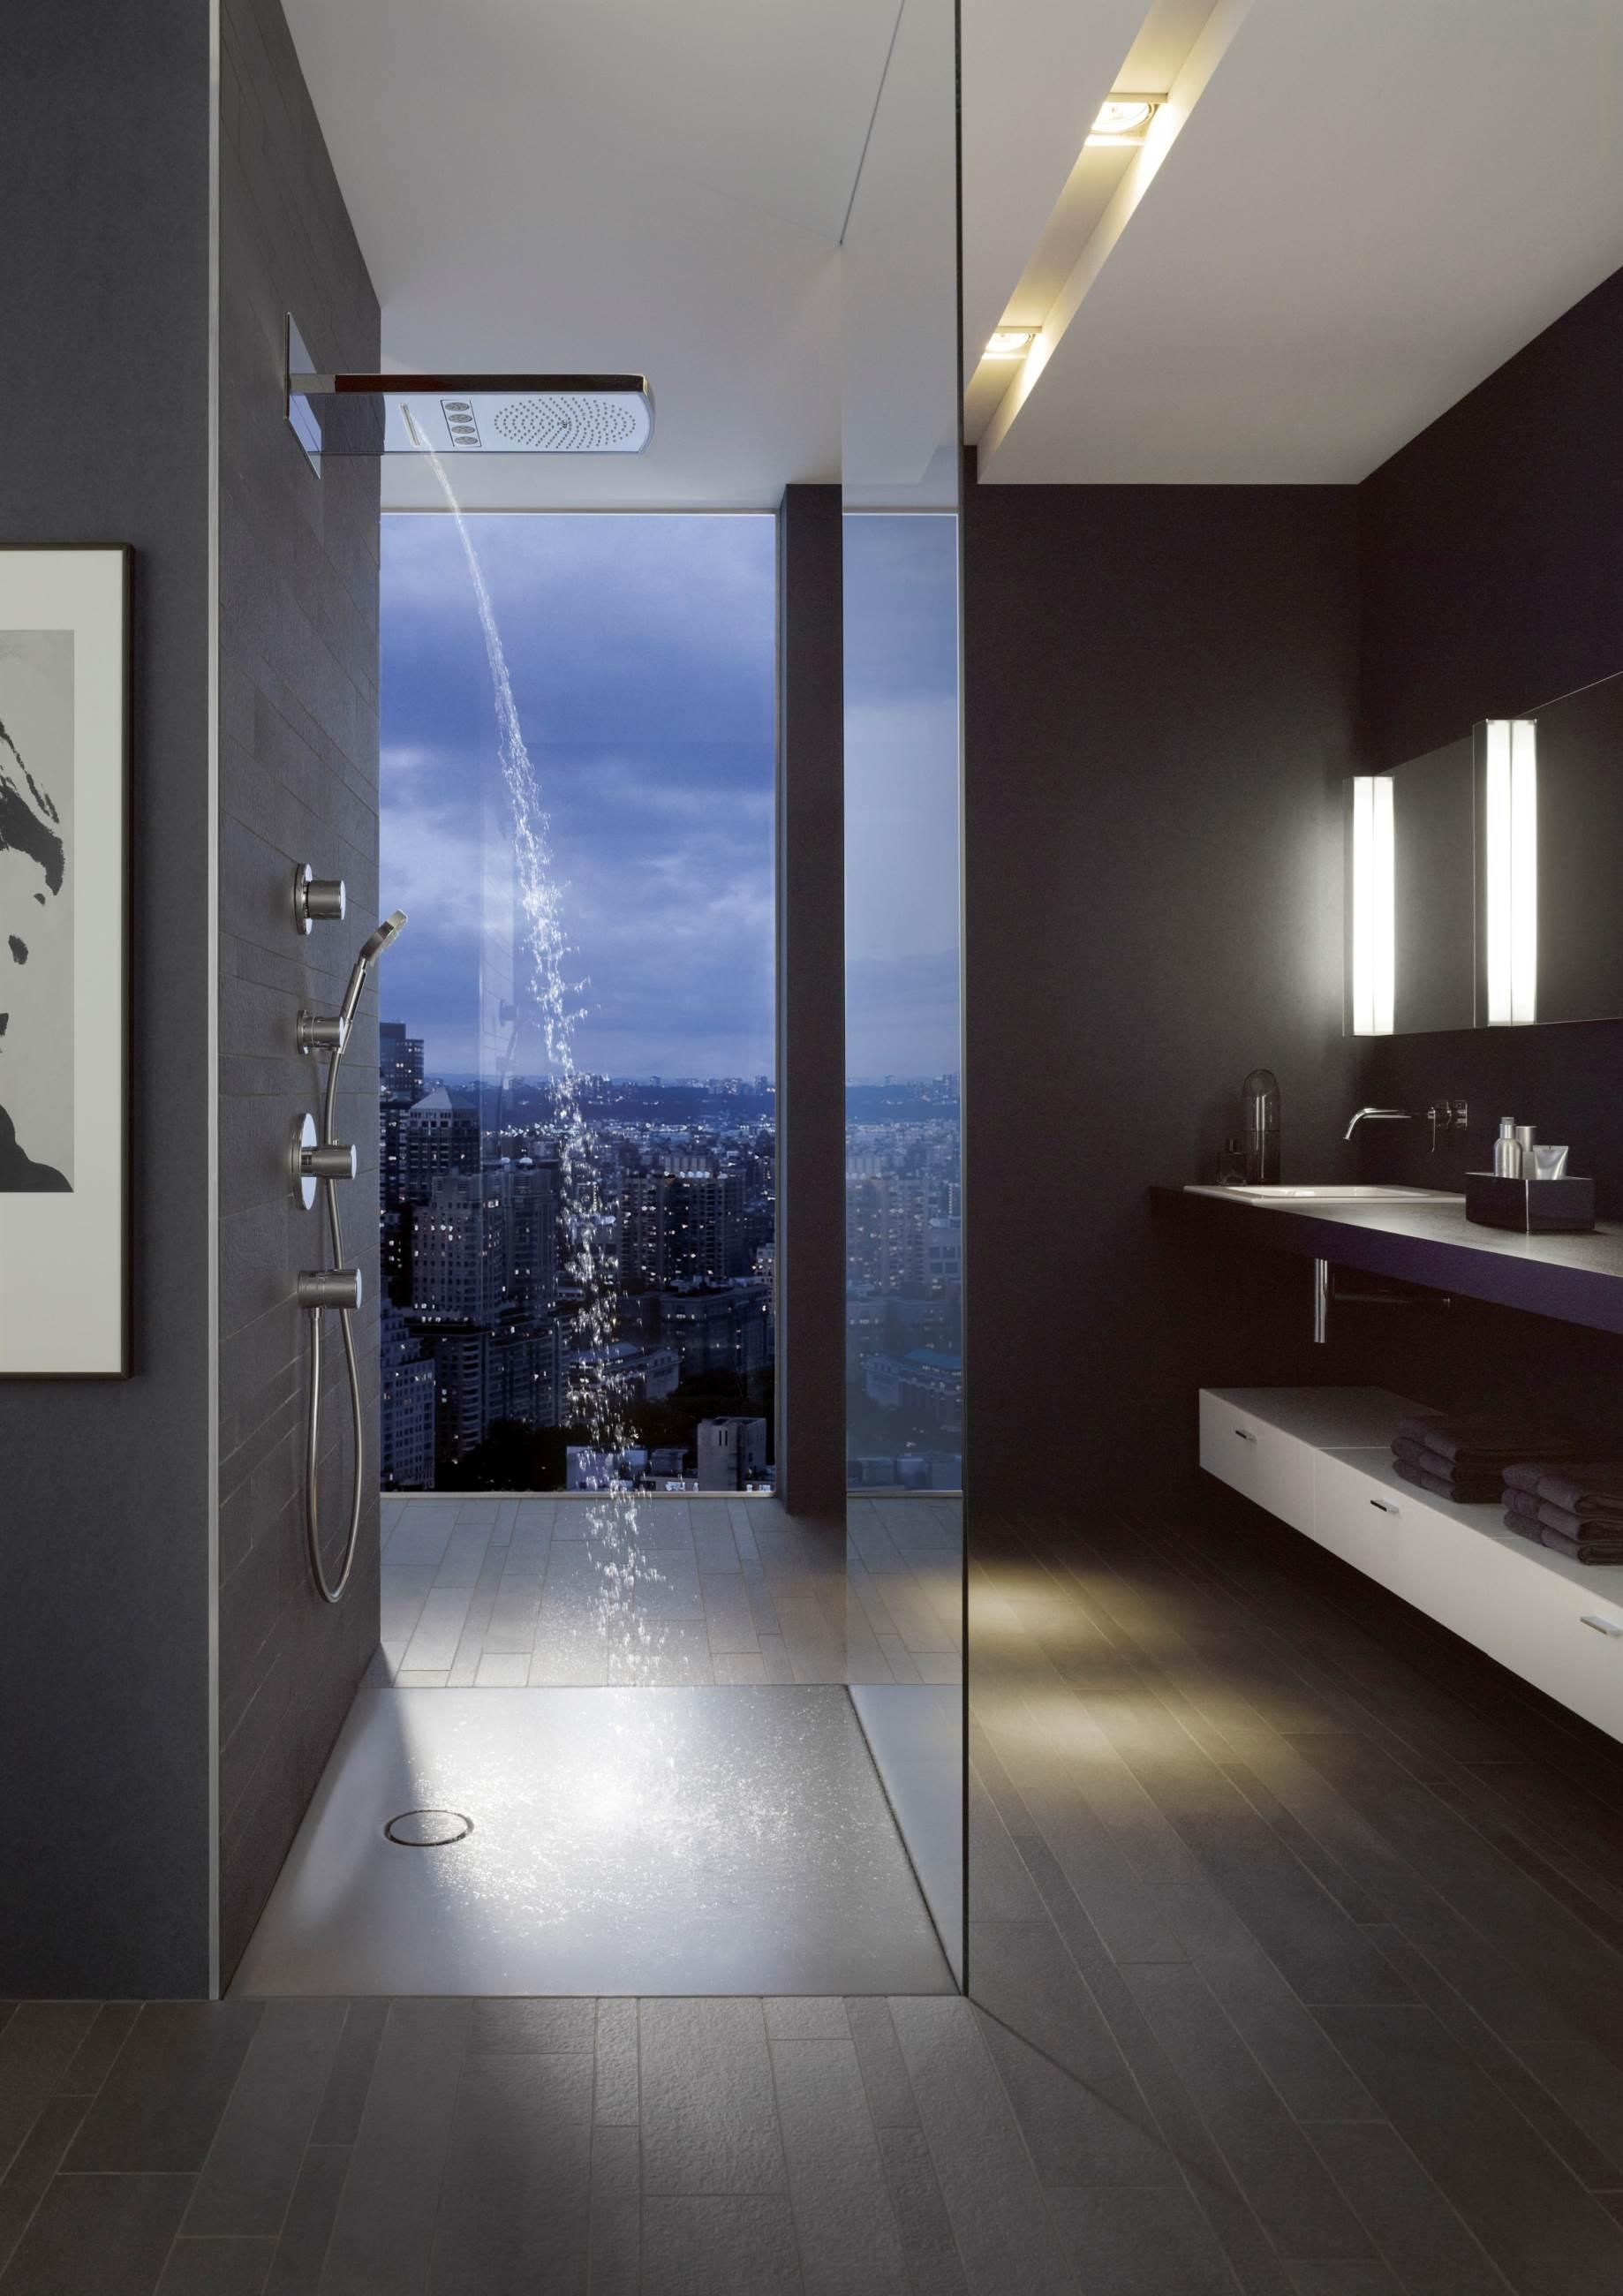 Badezimmer ideen schwarz bette floor manufacturers  beautiful bathrooms  banheiros